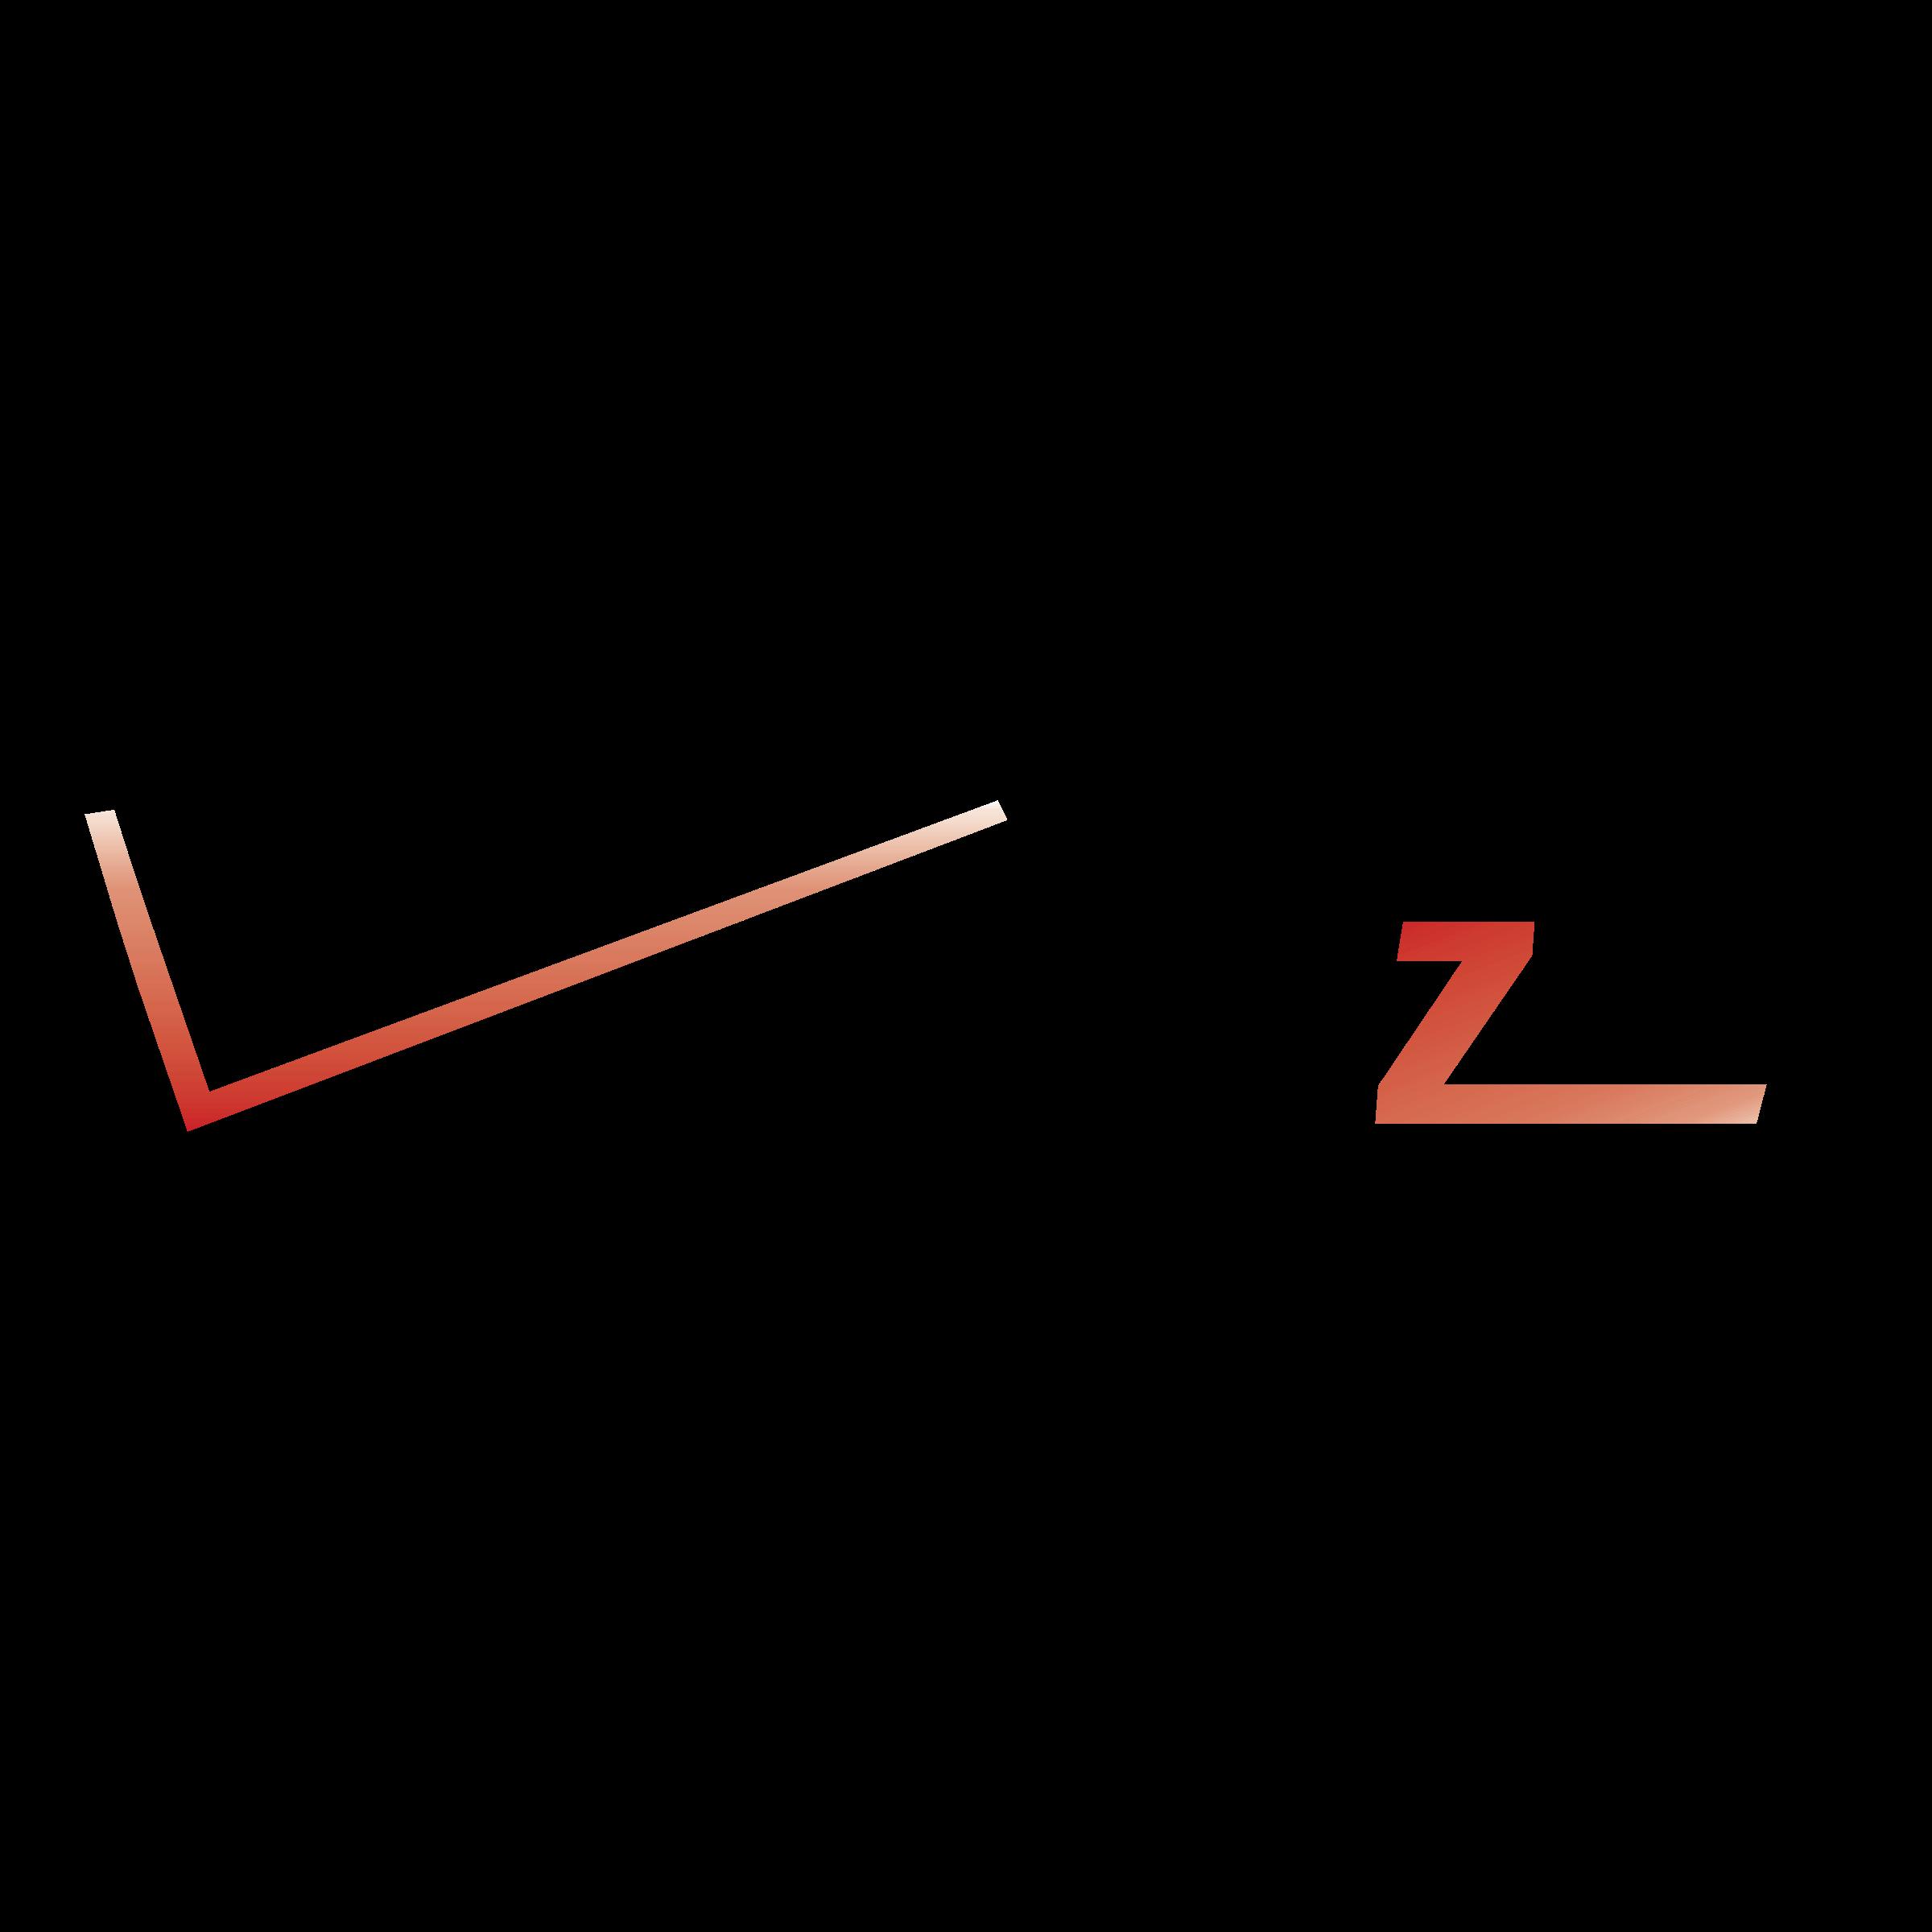 verizon logo png transparent svg vector freebie supply rh freebiesupply com Verizon Logo Transparent Verizon Wireless Logo Vector